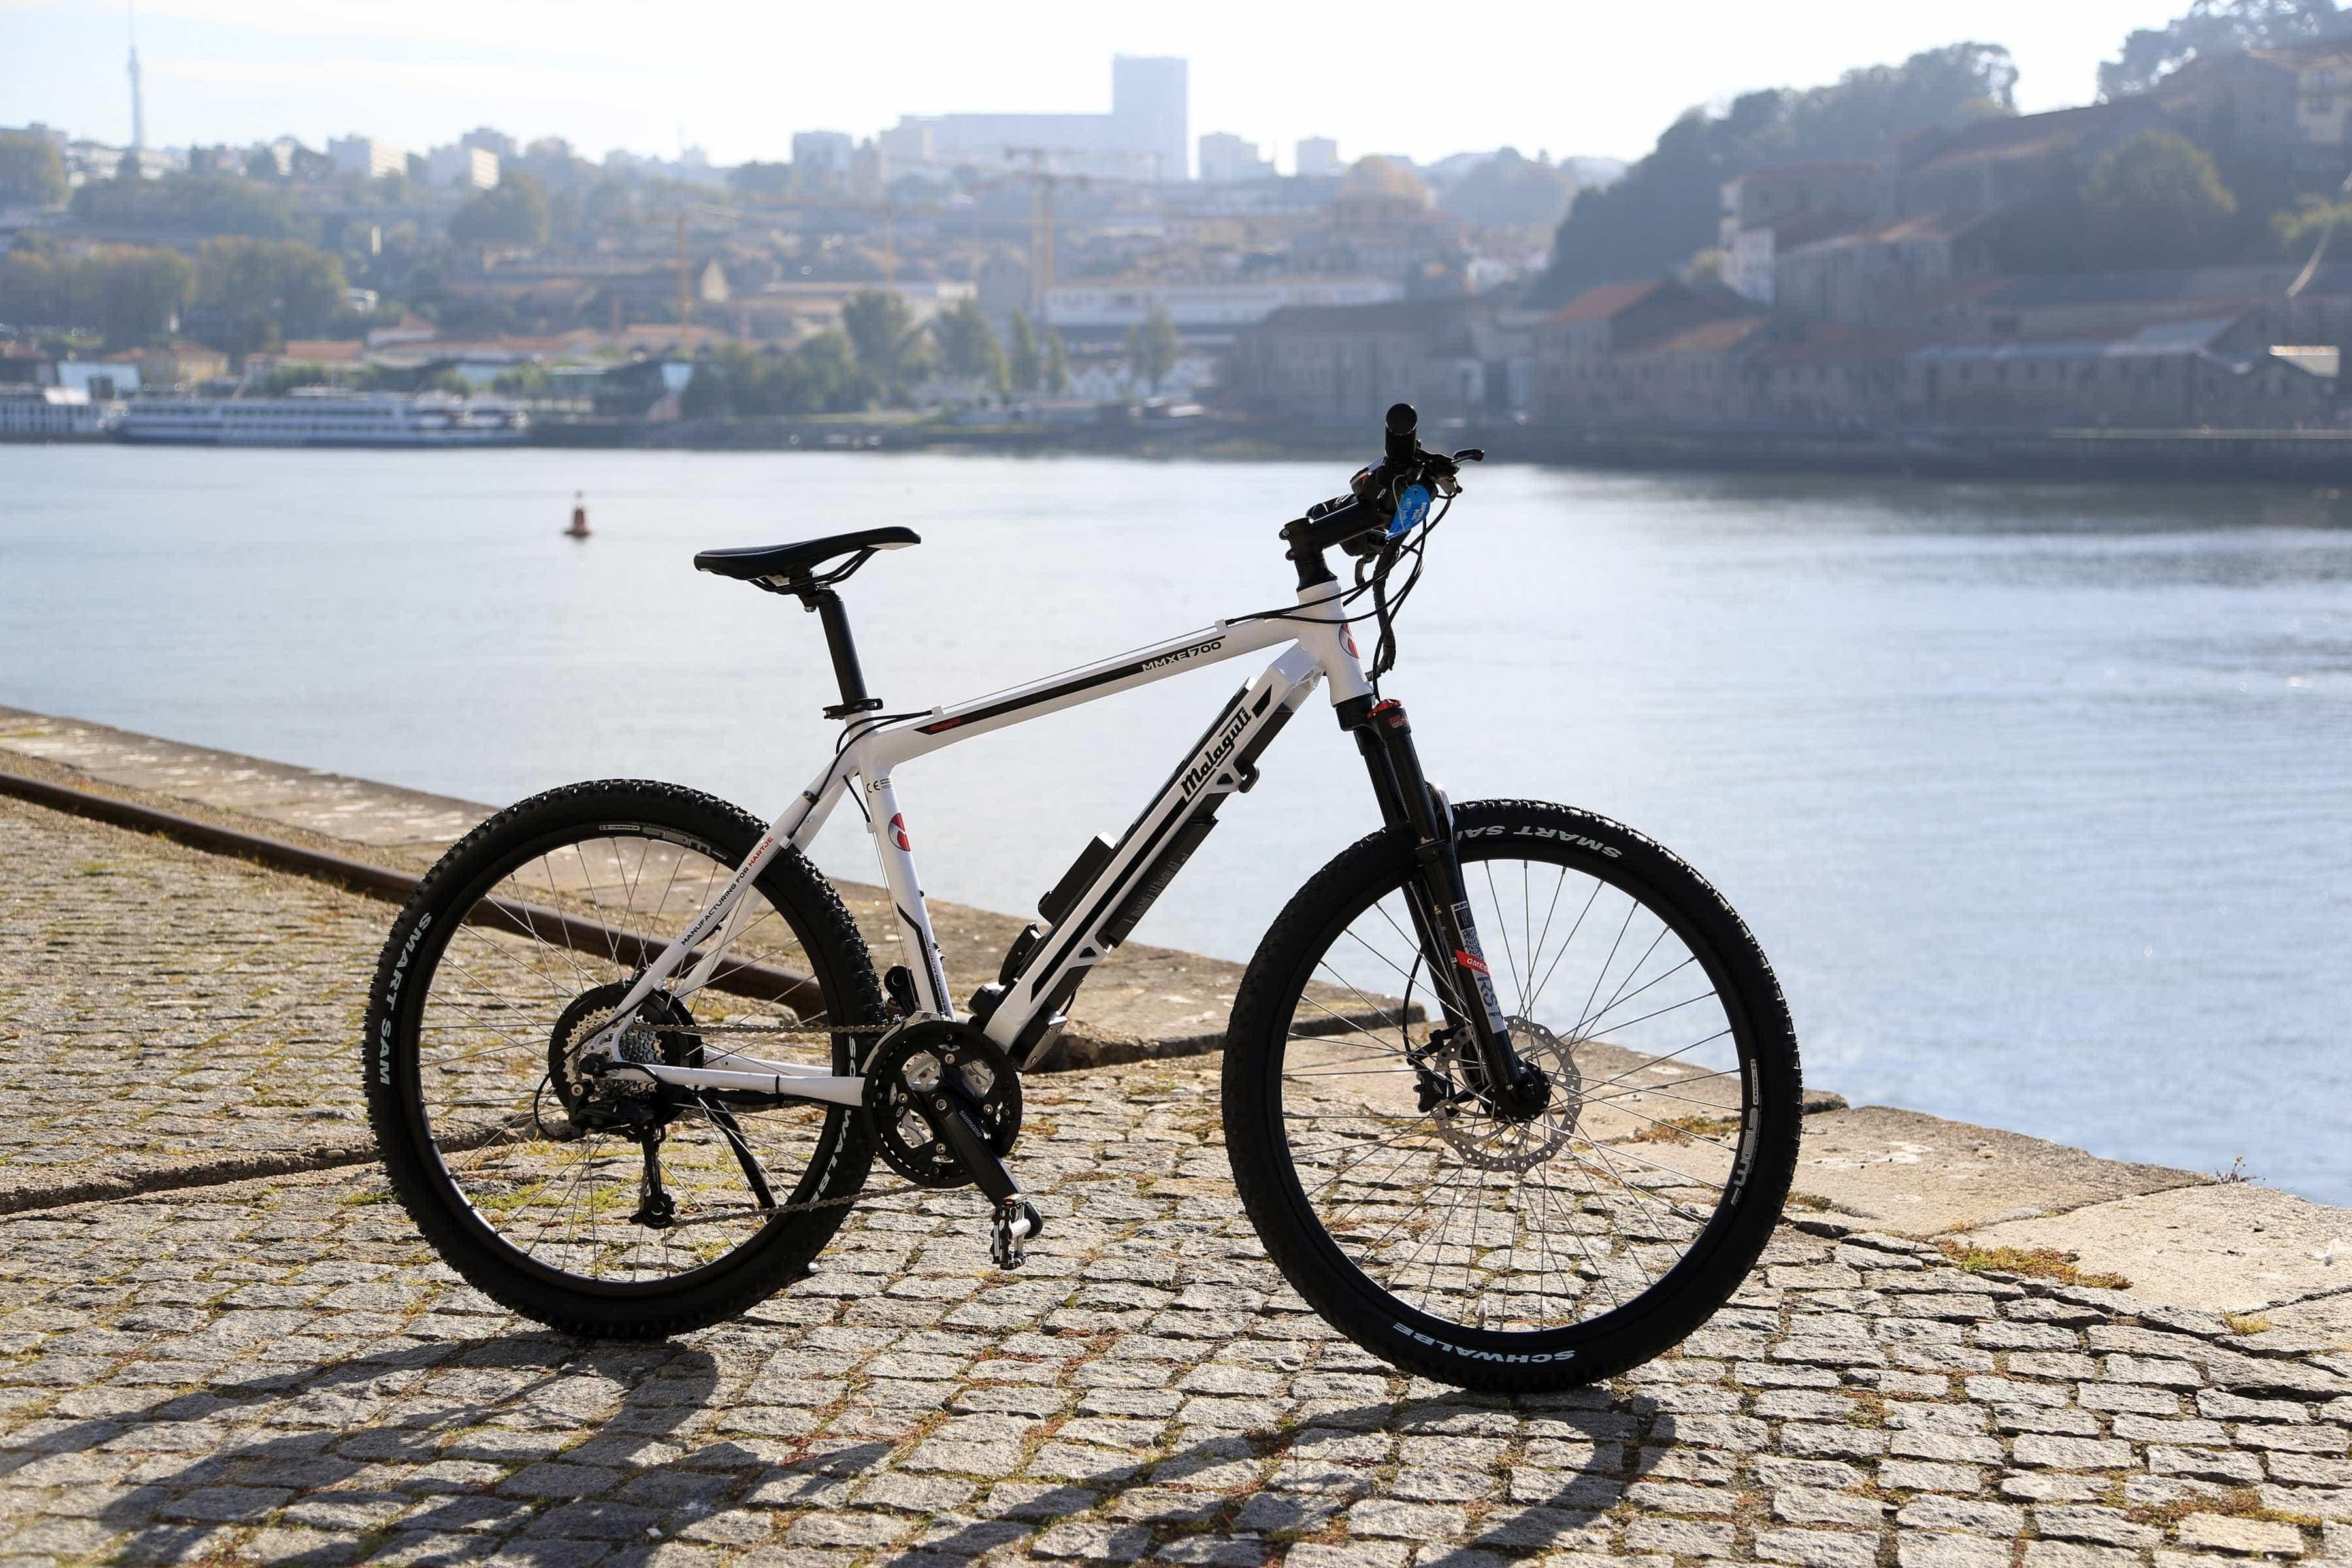 Estado vai dar incentivo de 250 euros para compra de bicicletas elétricas